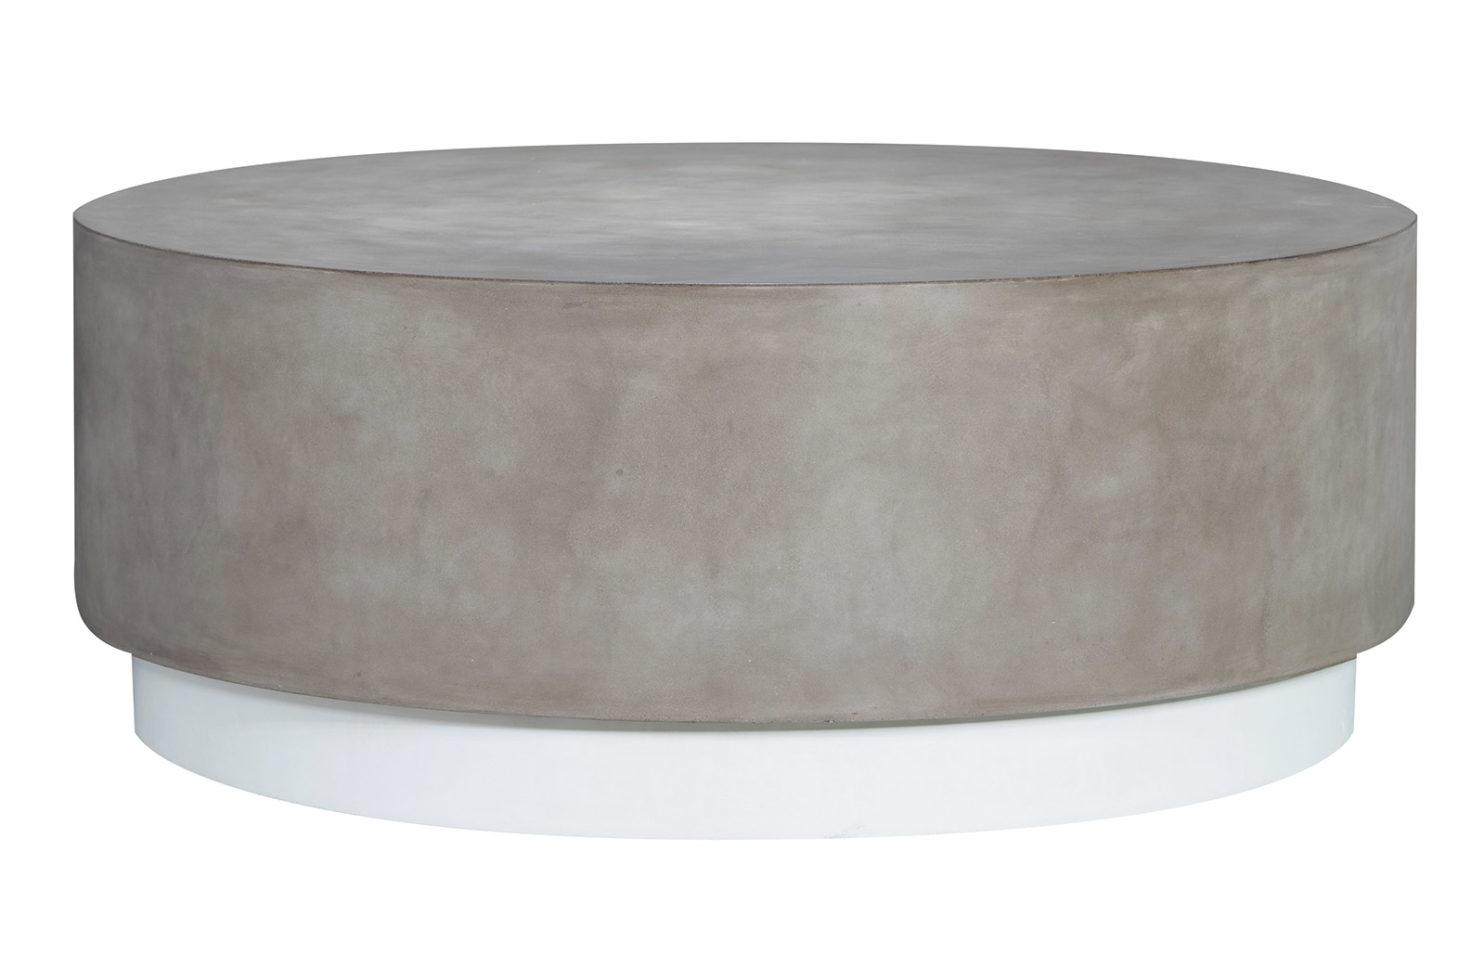 Perpetual poncho coffee table 501FT185P2GW